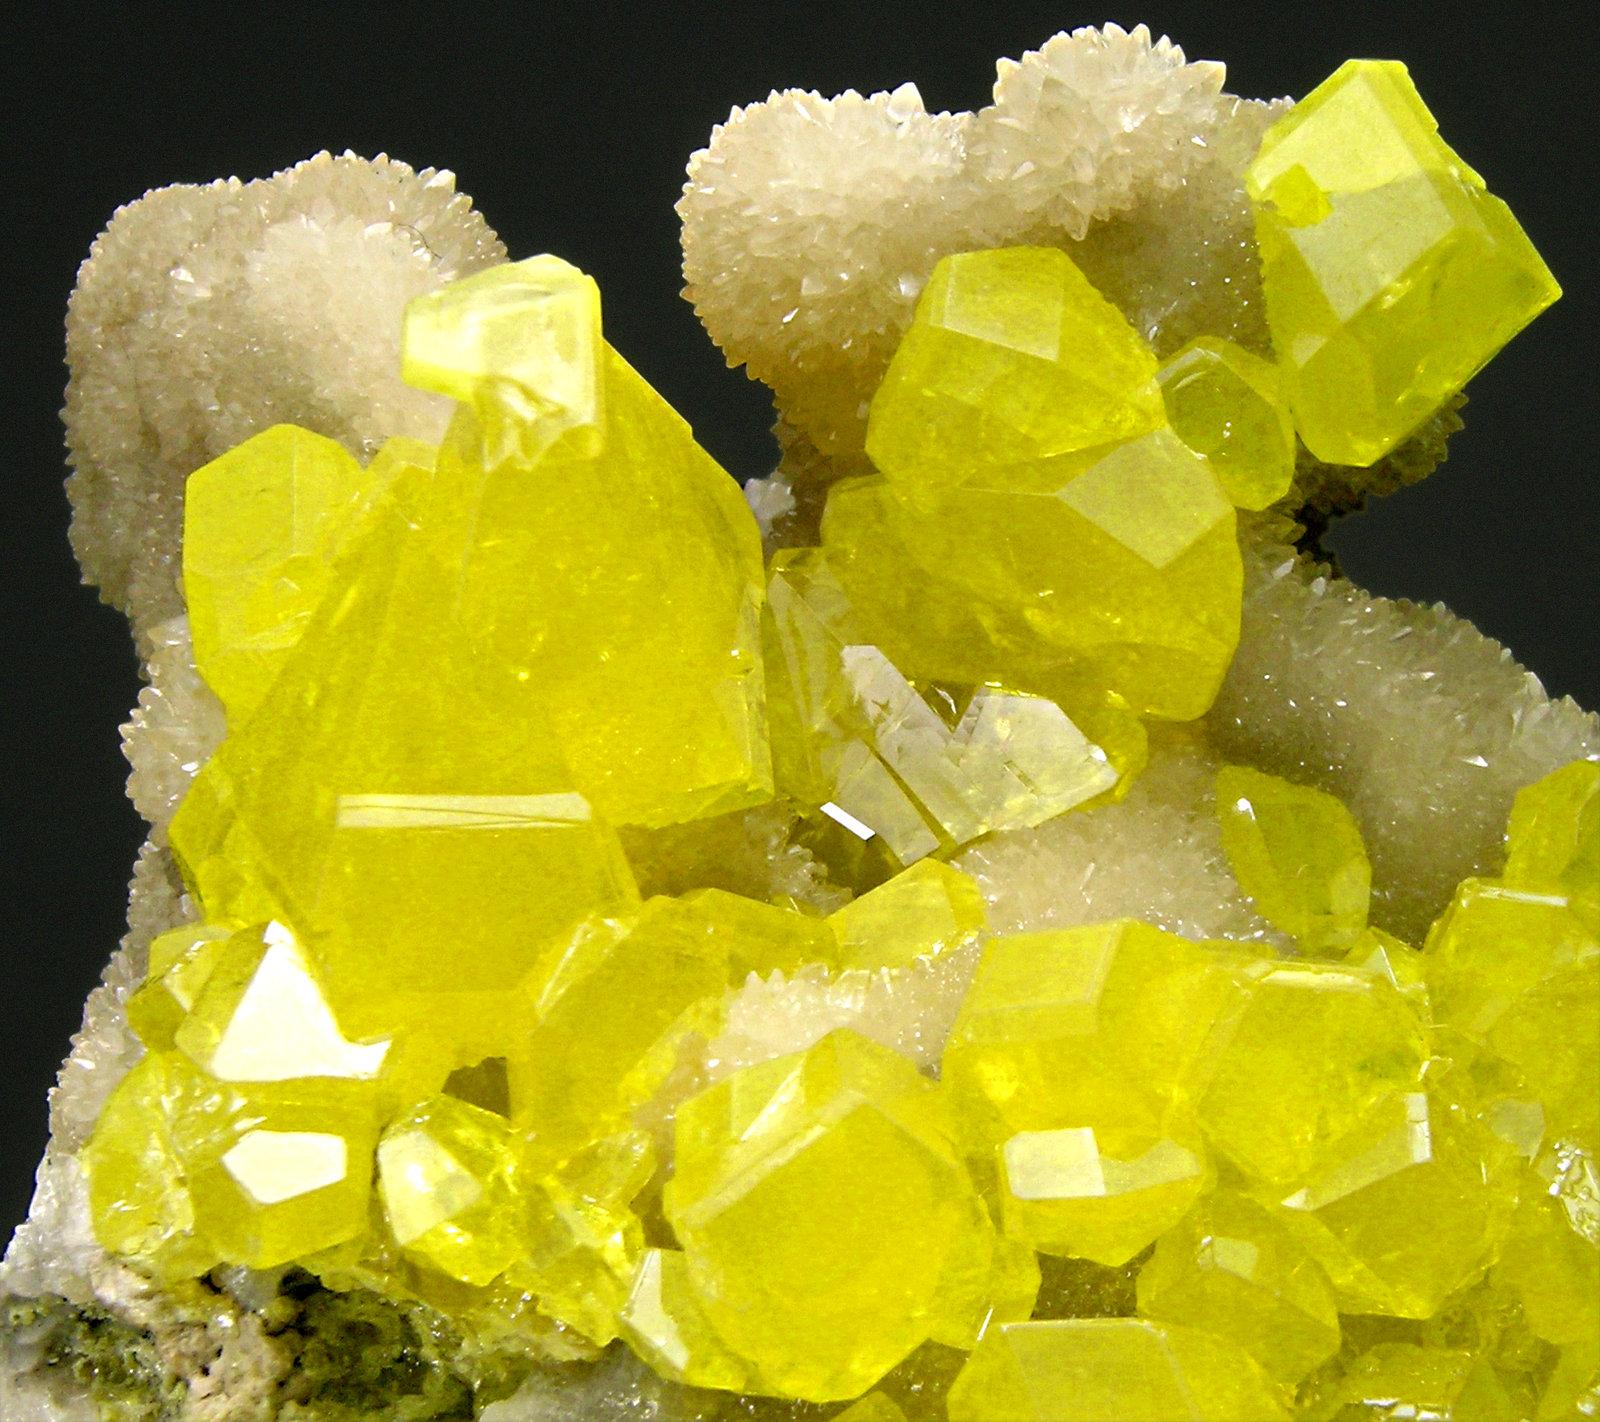 "Sulfur 5"" x 3"" - Celestial Earth Minerals |Sulfur Mineral"